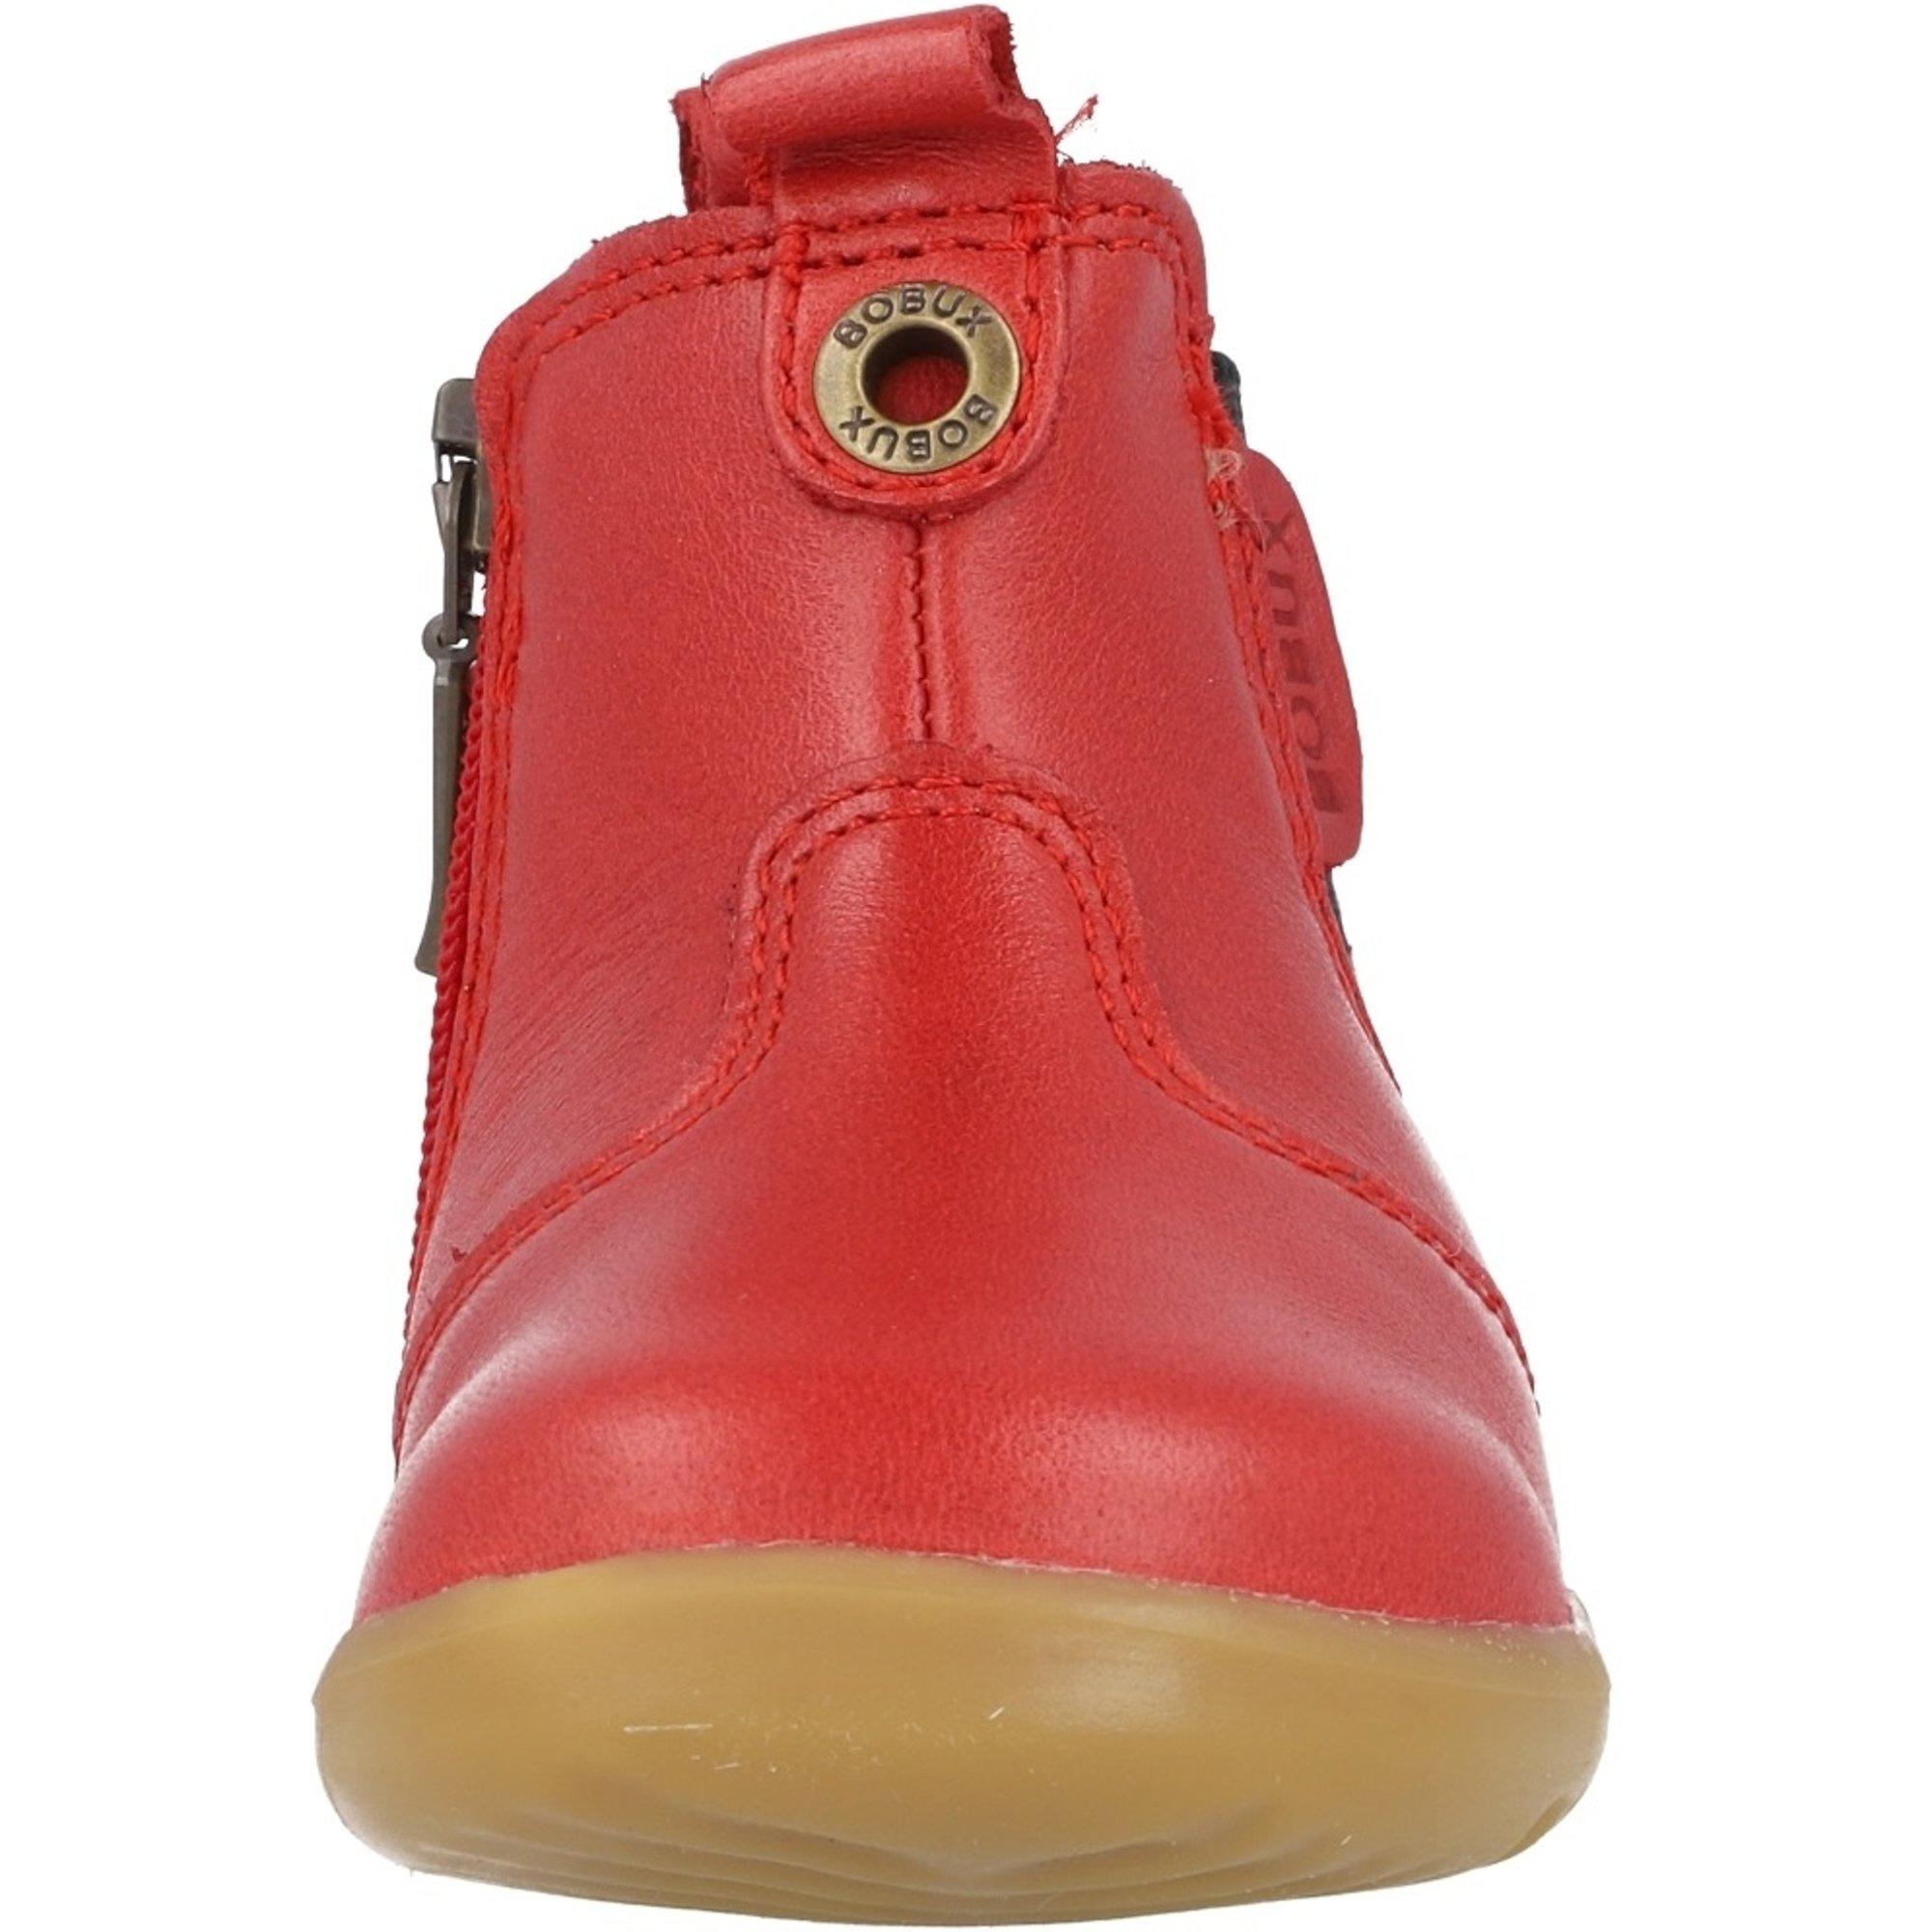 Bobux Step Up Jodhpur Red Vintage-Look Leather